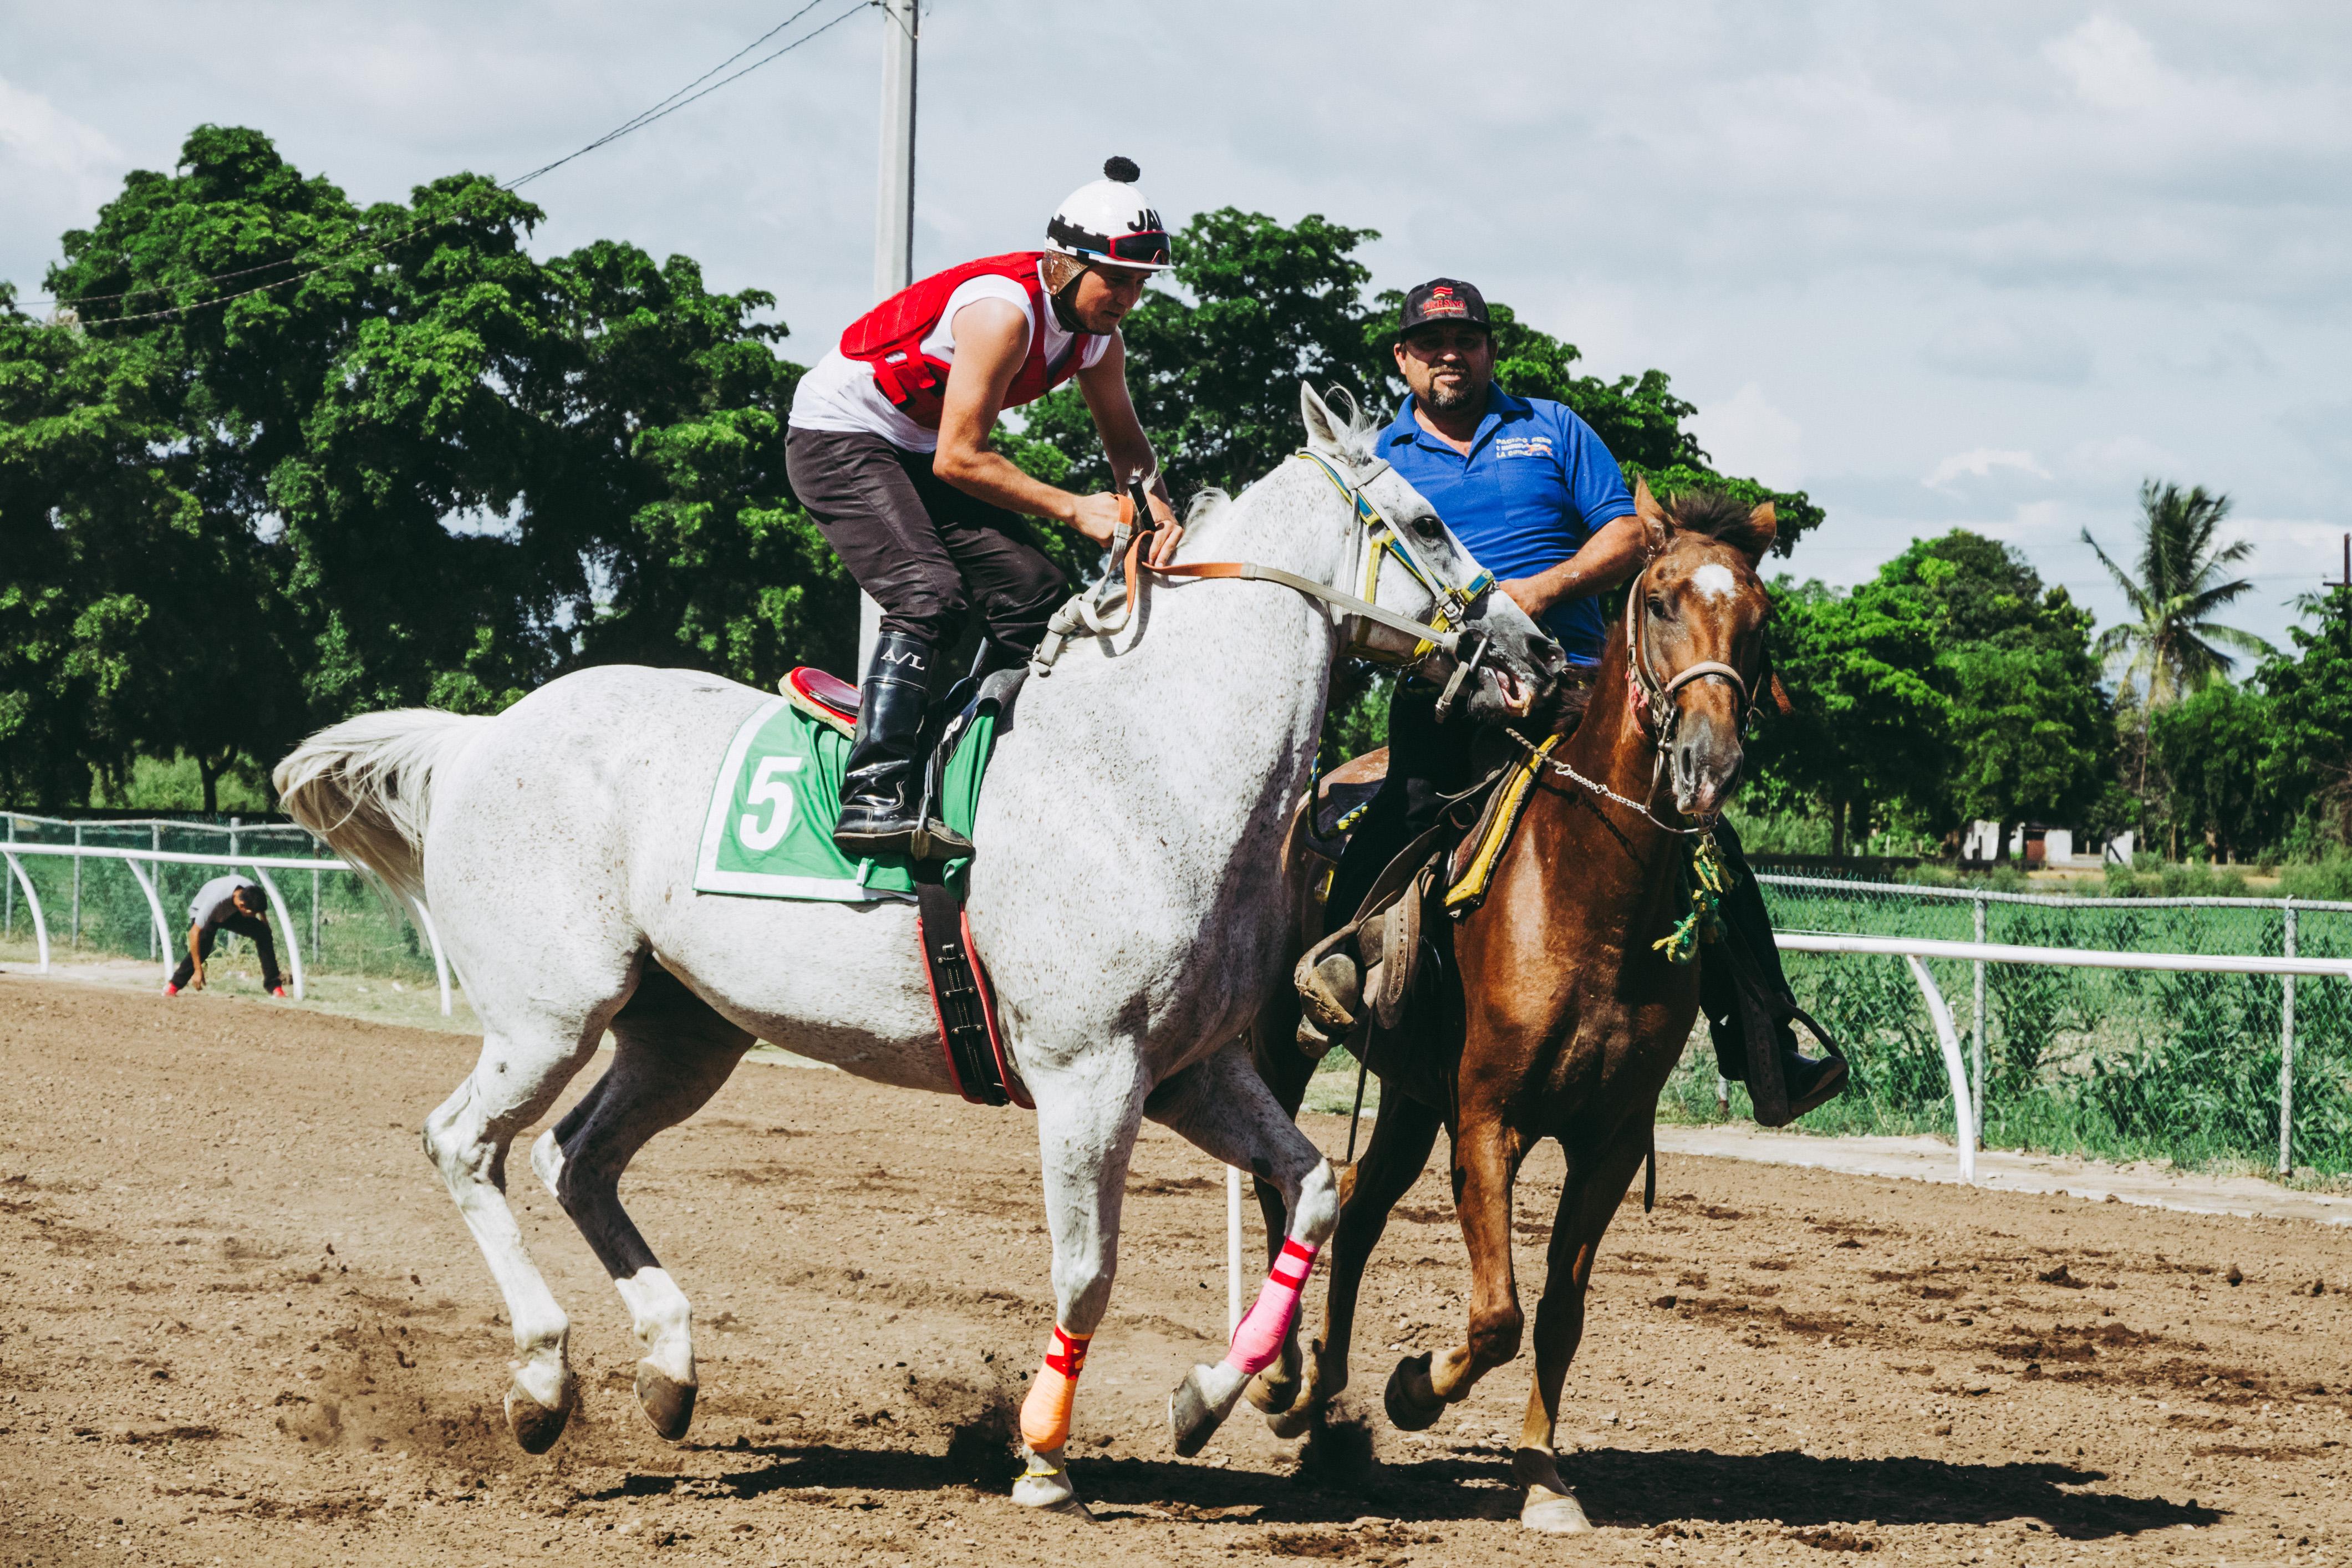 Two Men Riding on Horses